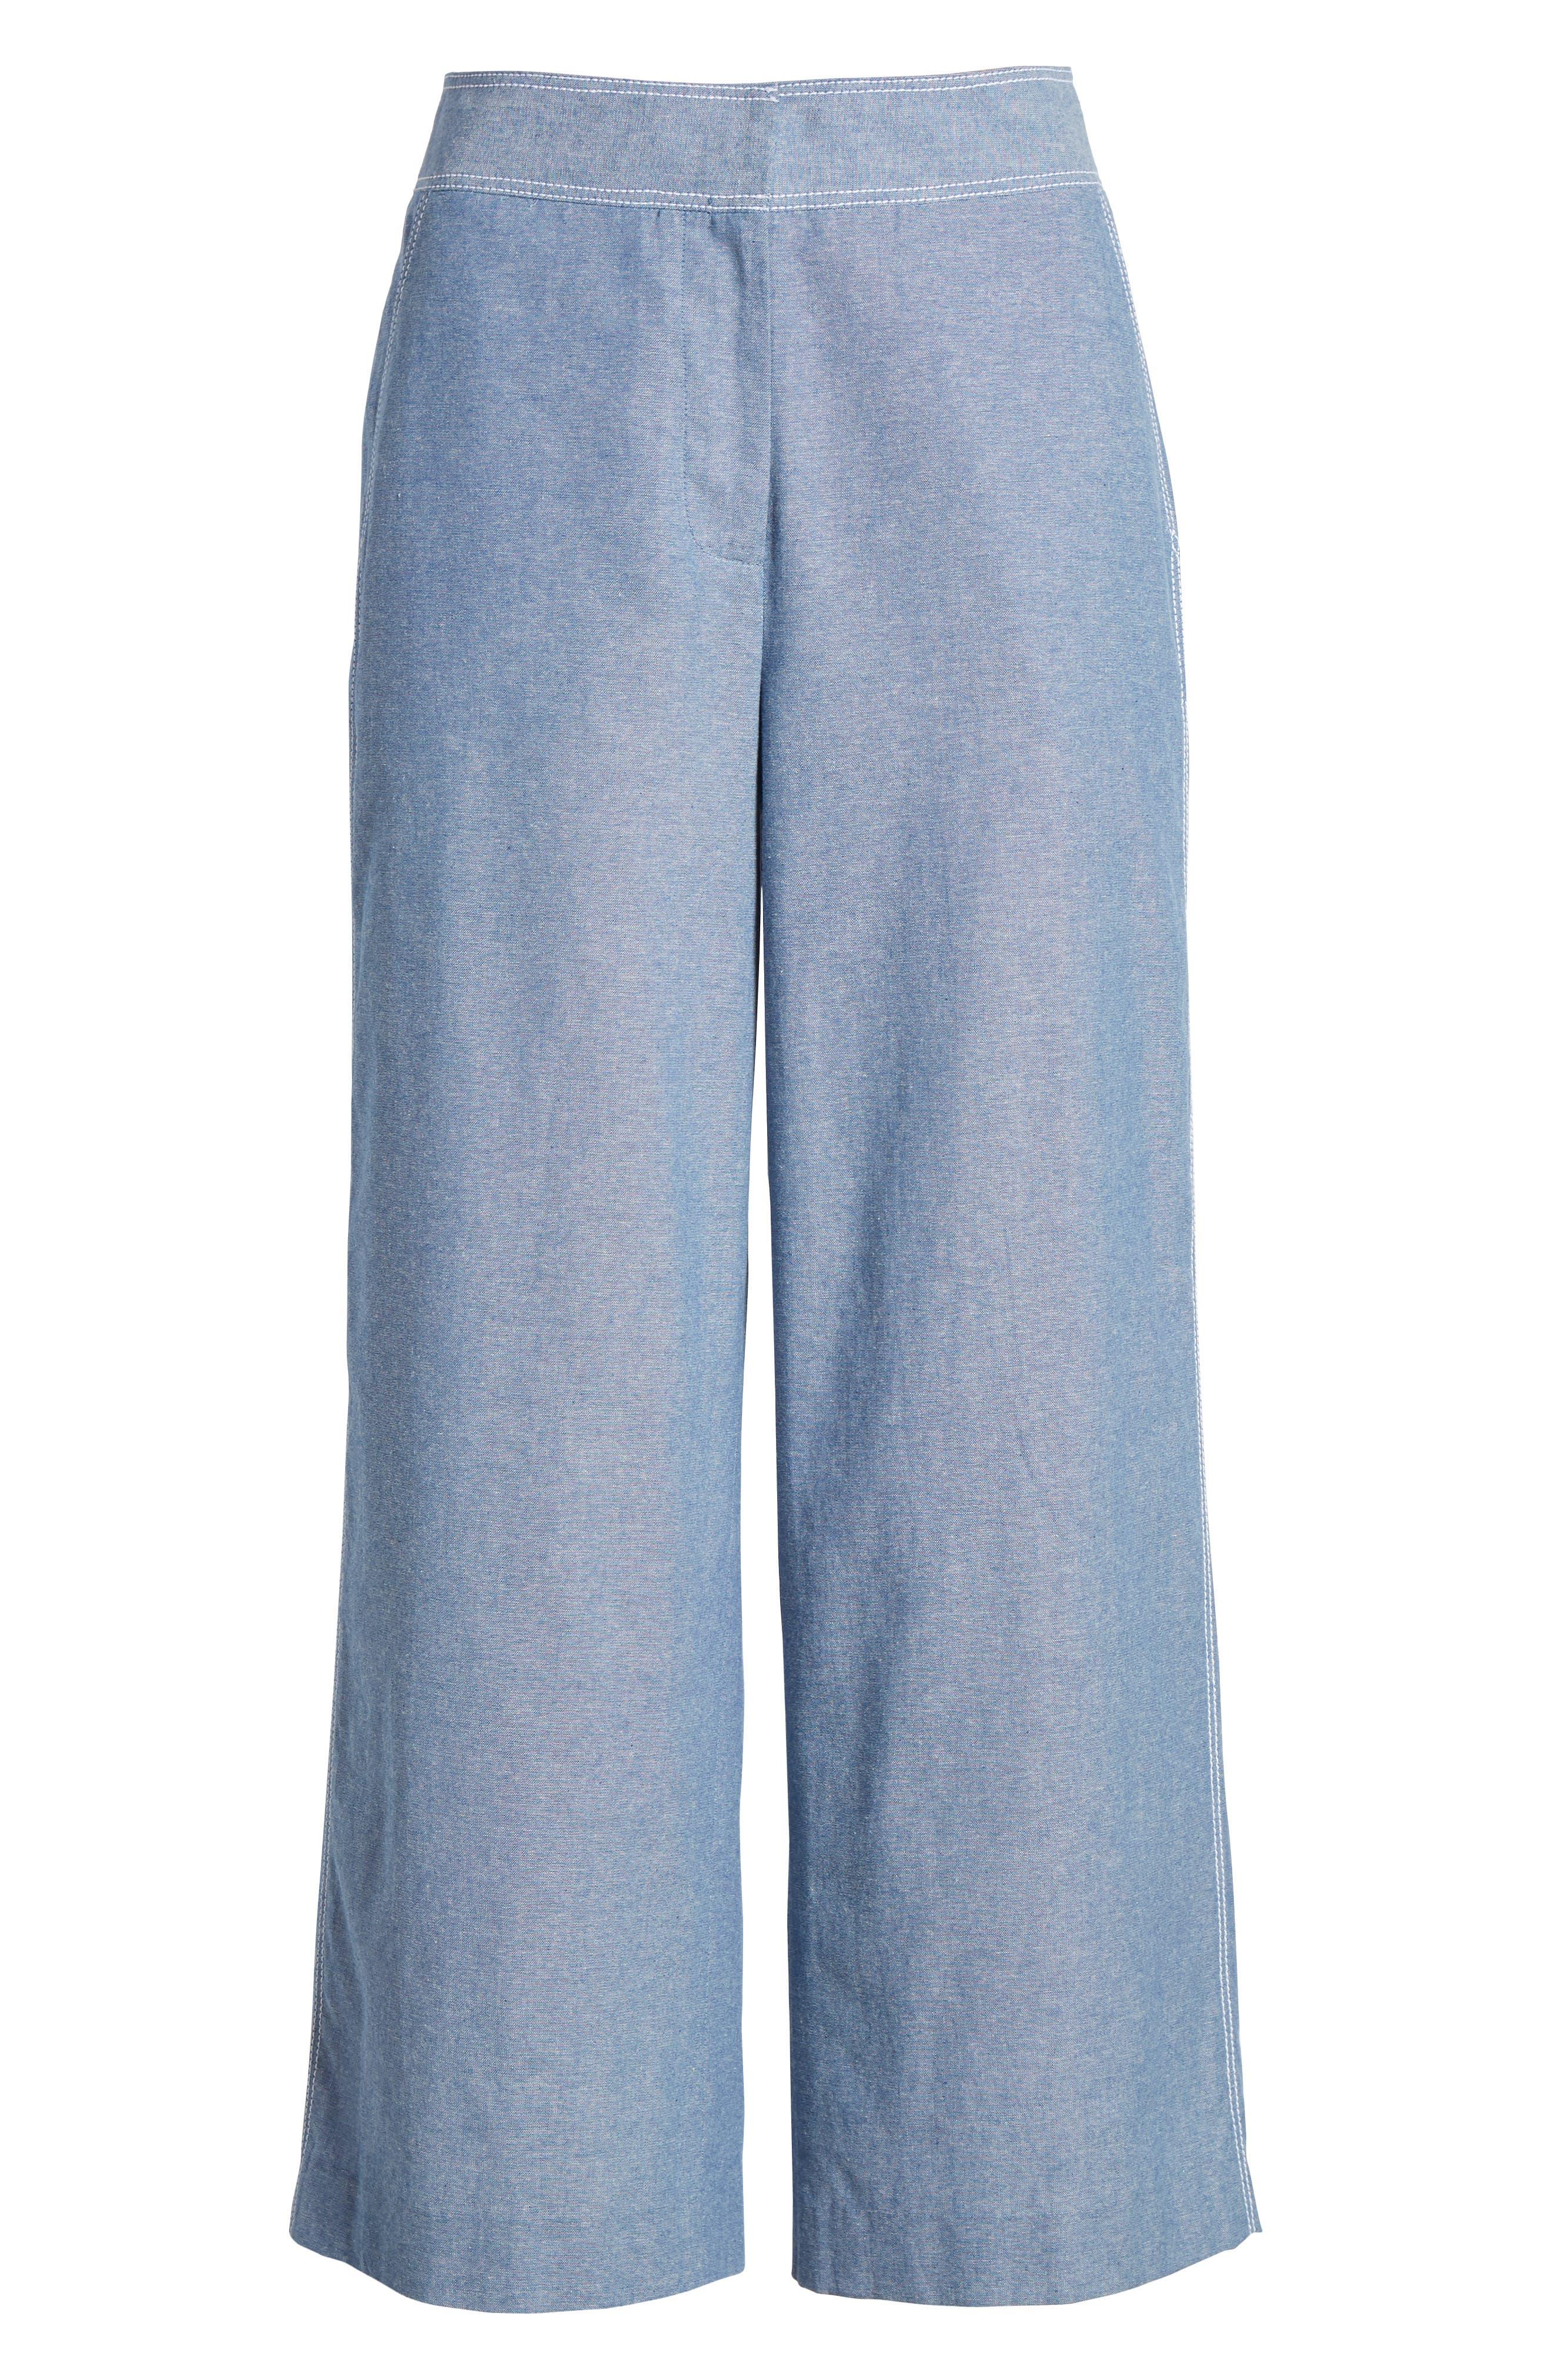 Wide Leg Linen Blend Pants,                             Alternate thumbnail 7, color,                             Chambray